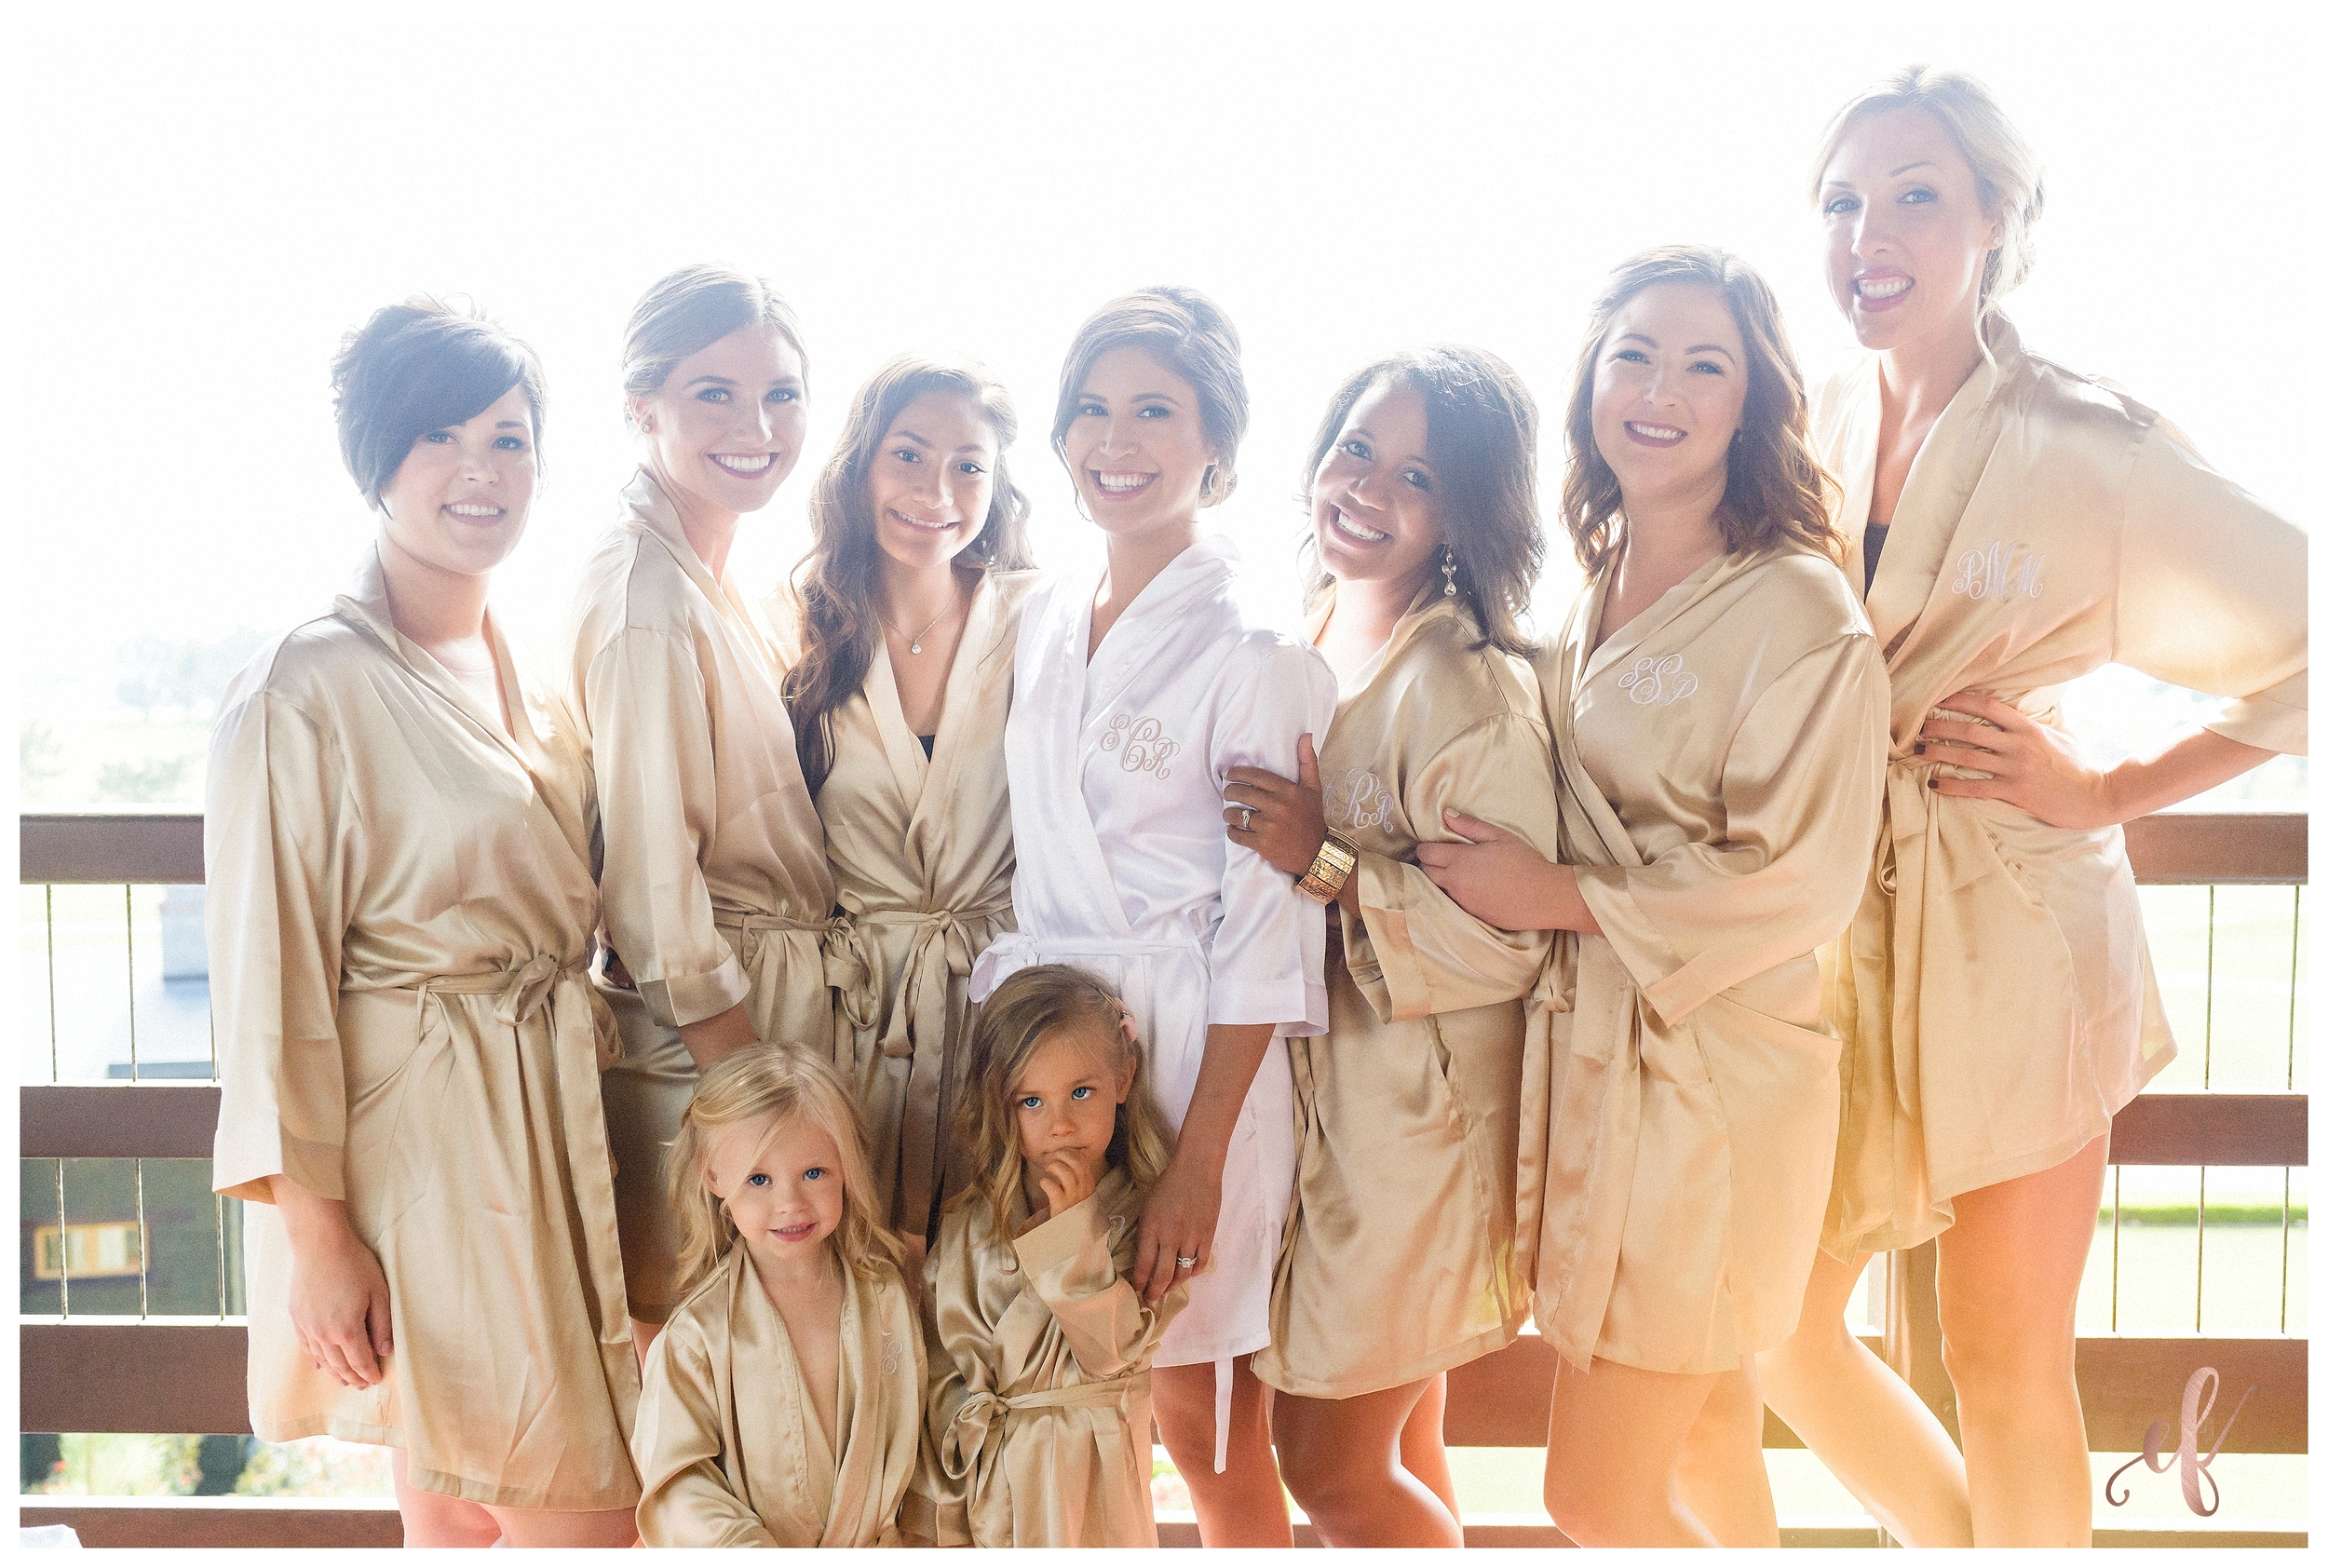 San Diego Wedding Photographer   Ernie & Fiona Photography   Bridesmaids   Robes